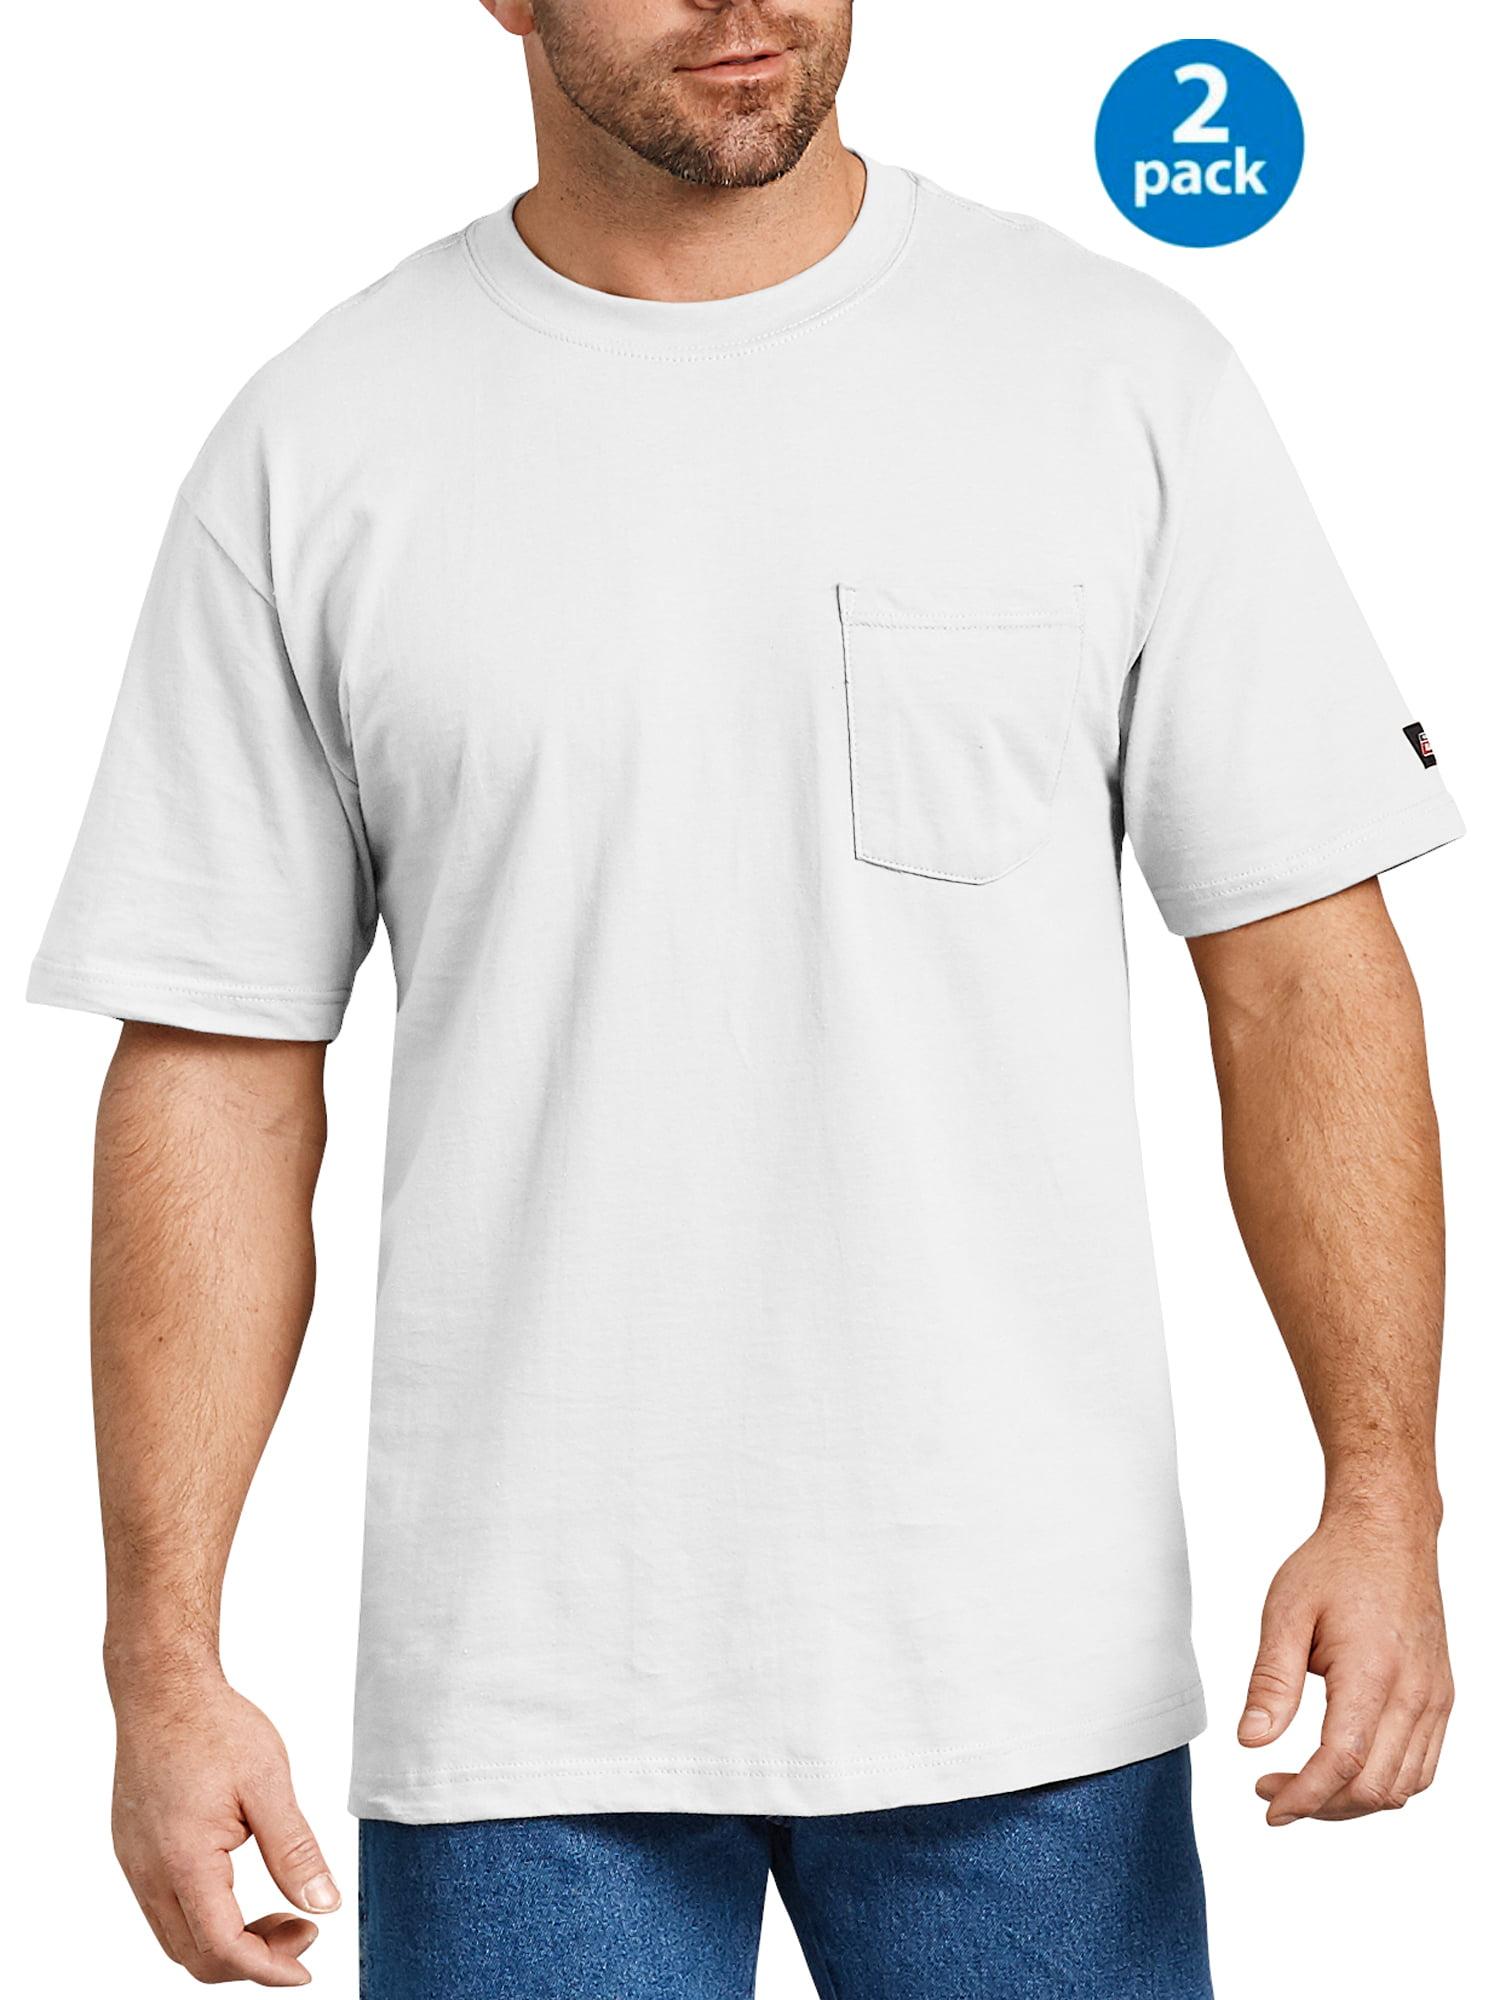 Men's Short Sleeve Heavy Weight Pocket T-Shirt, 2-Pack